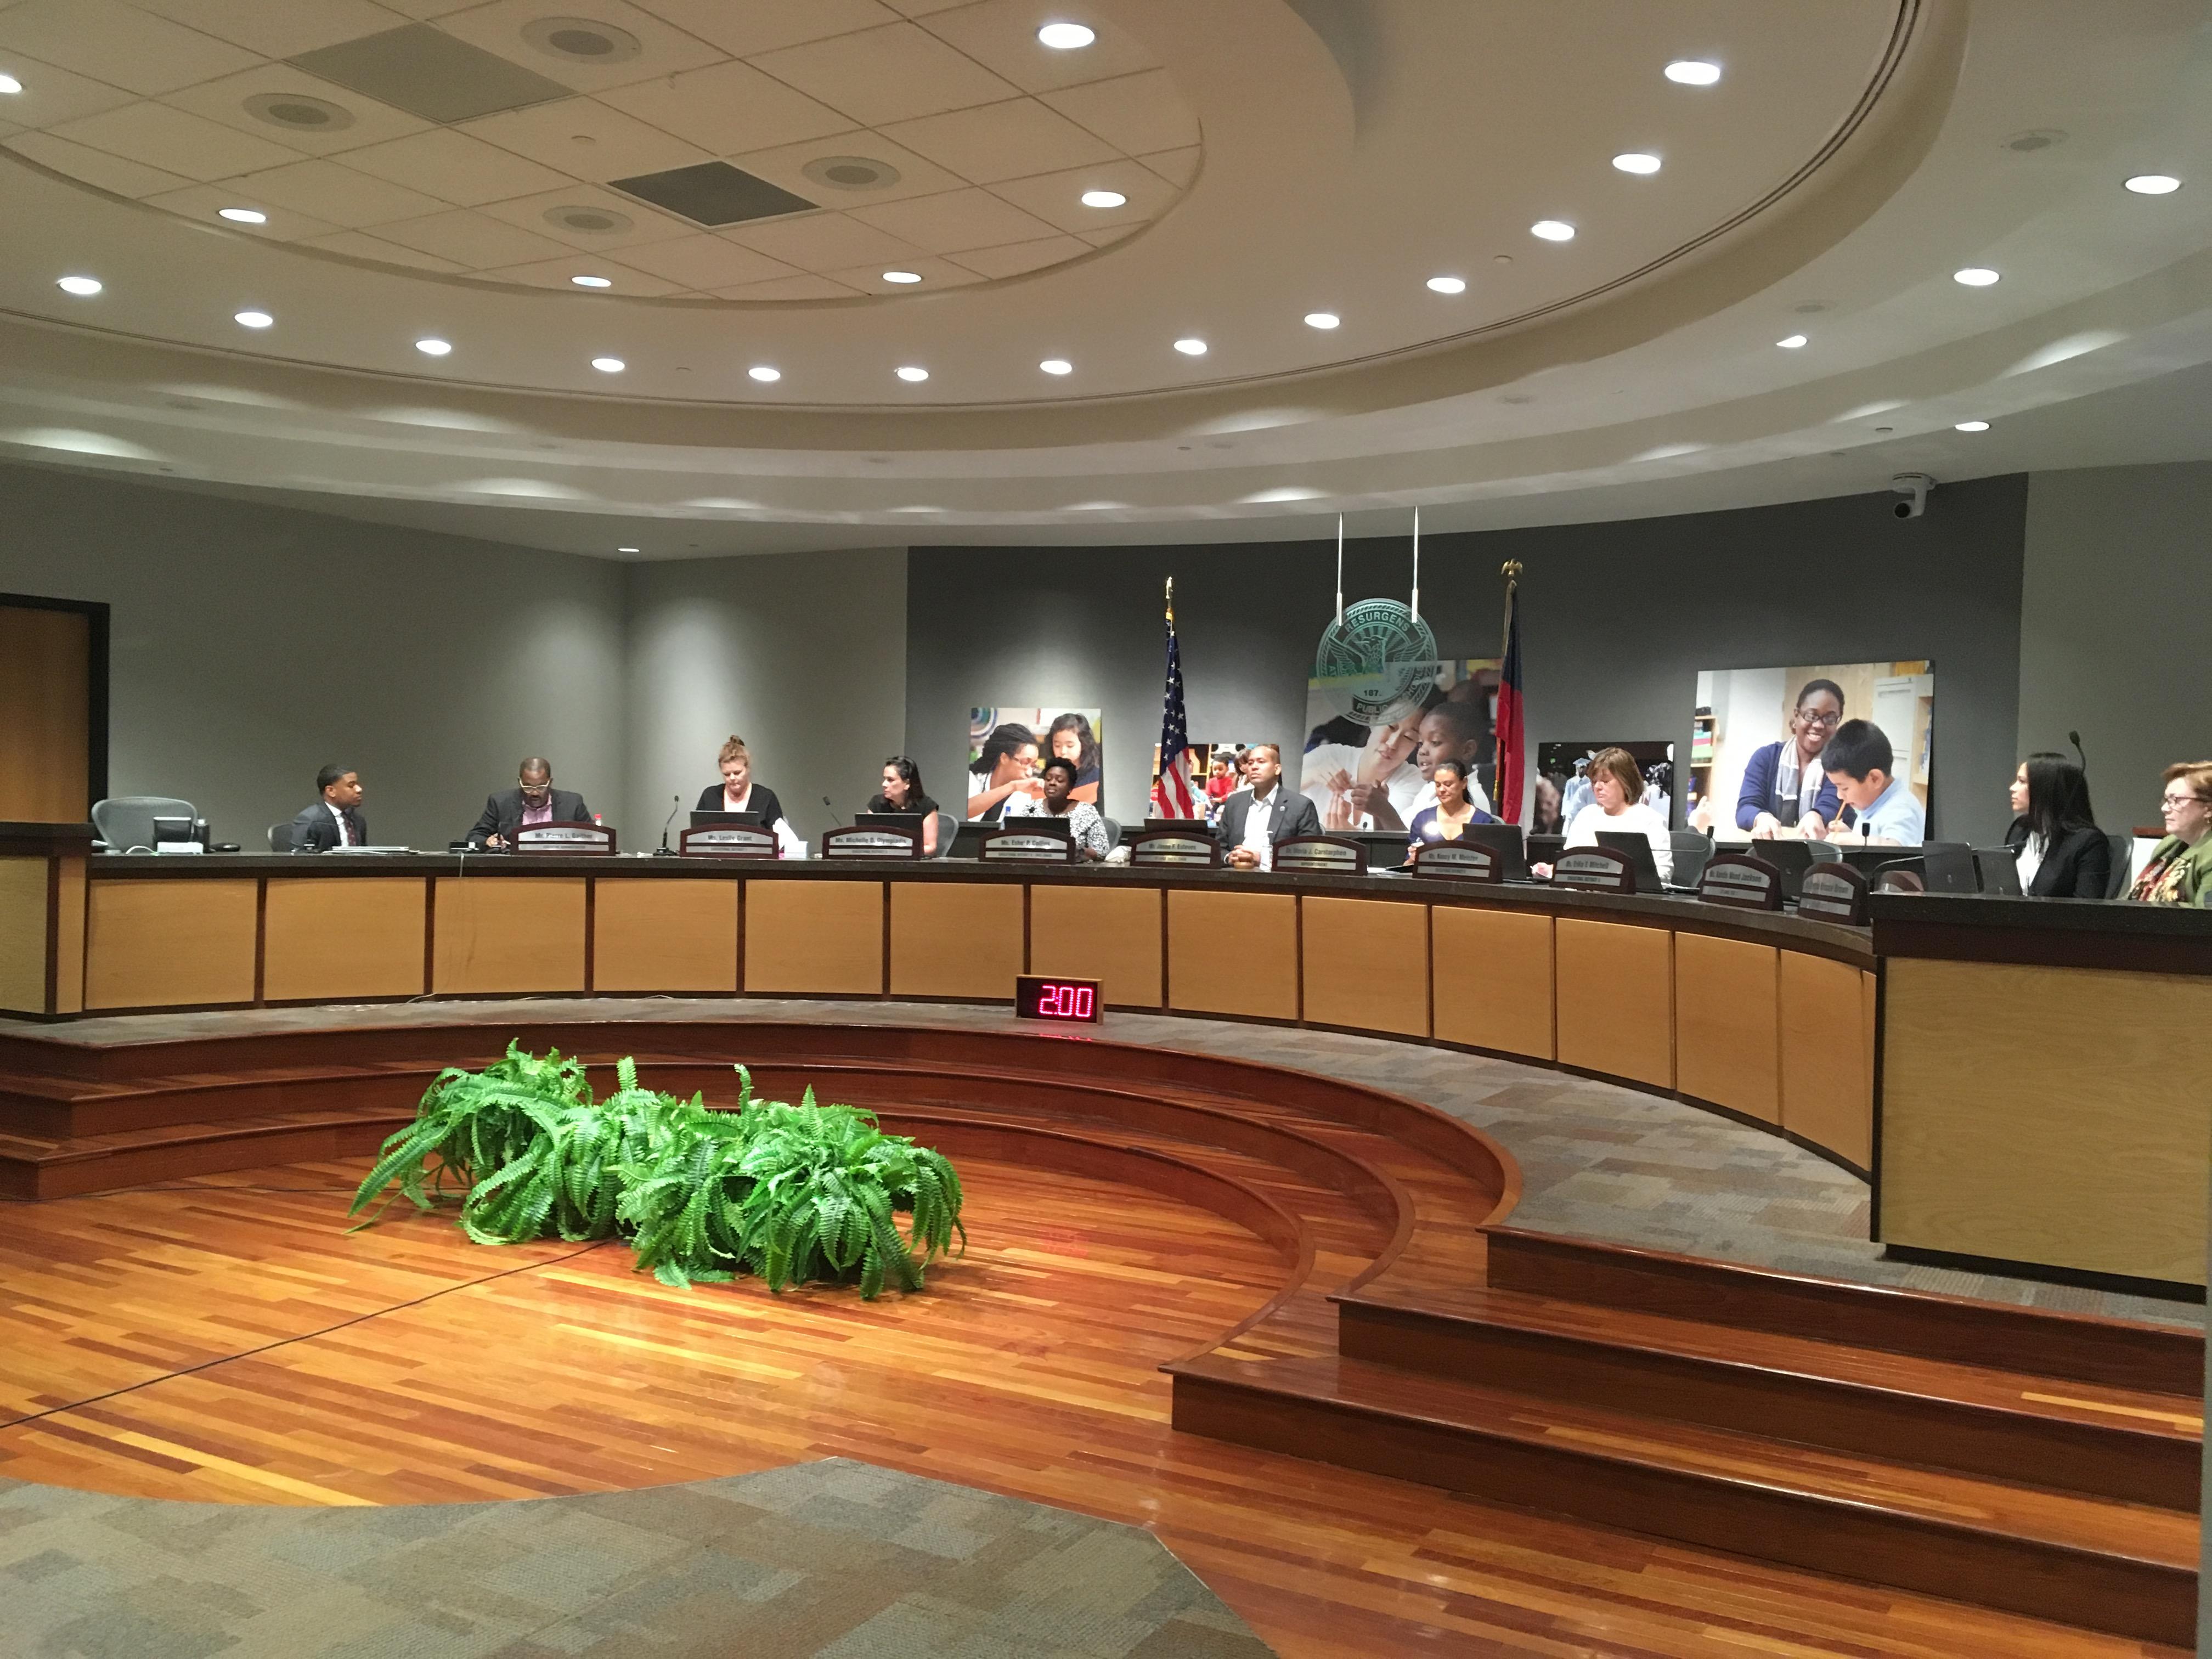 Board members sitting at meeting table at Atlanta Public Schools Board of Education meeting on Monday. Credit: Maggie Lee